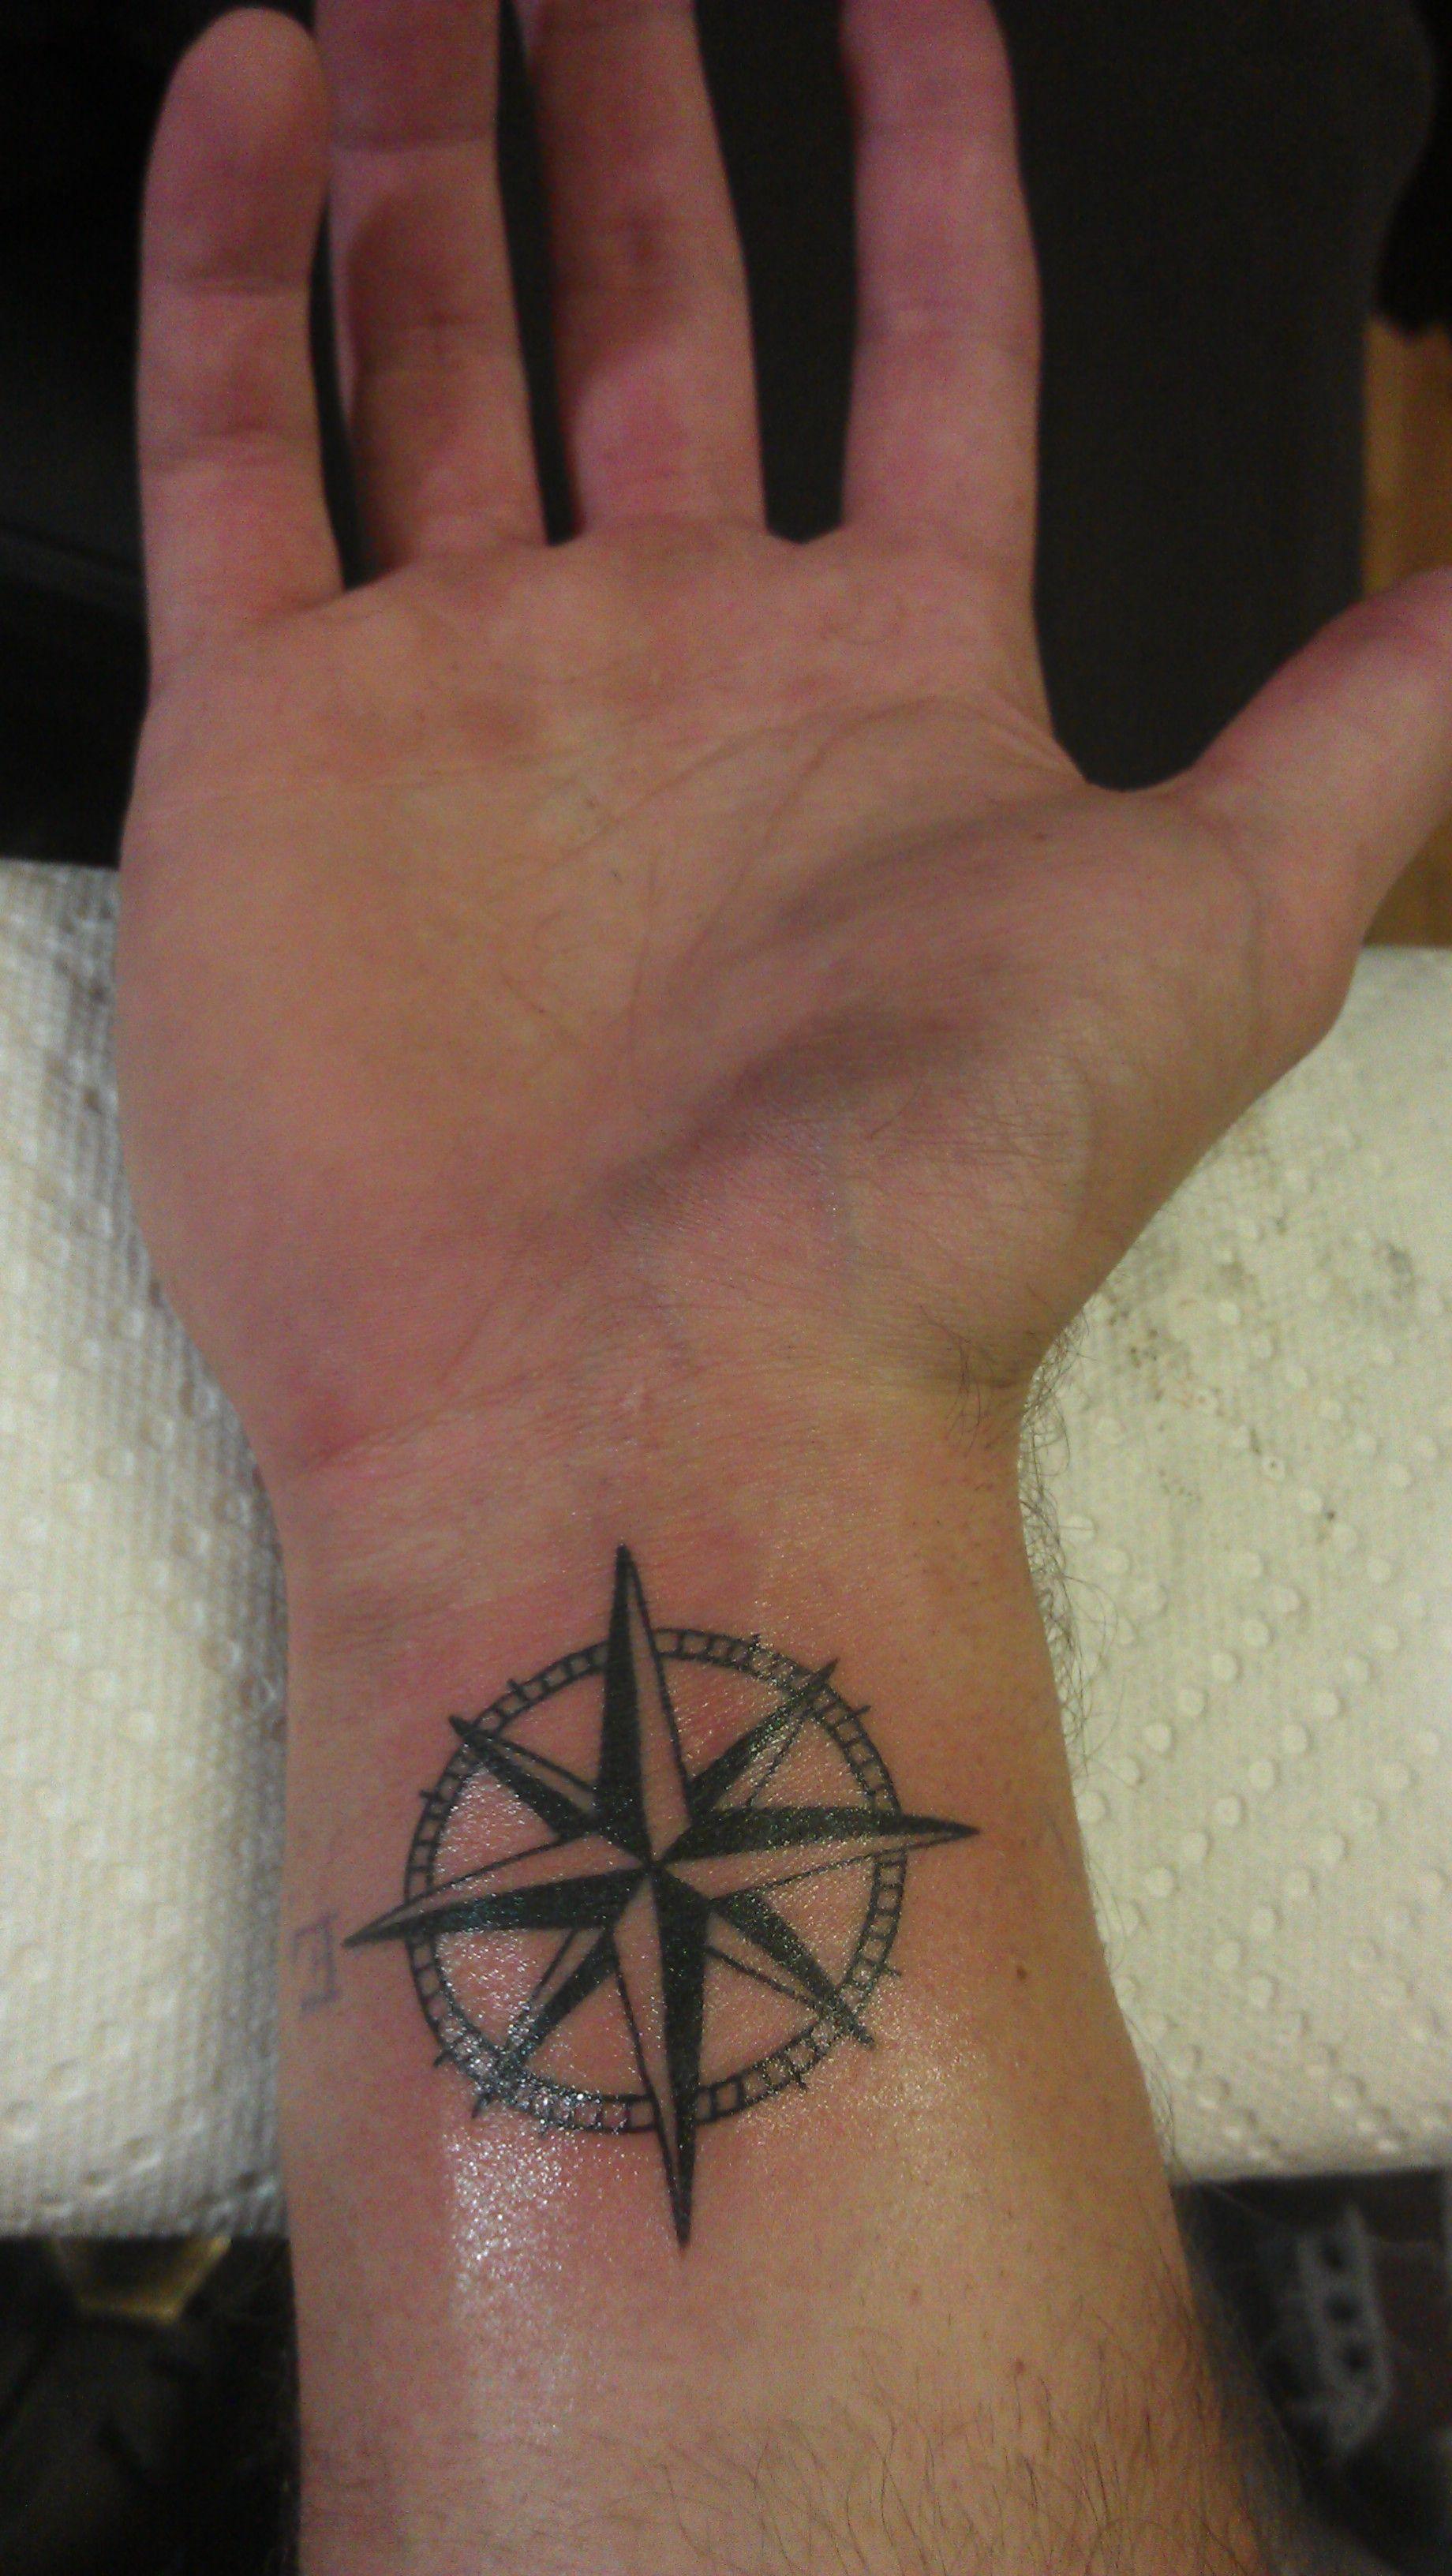 Nautical Star Tattoo, Got this in 2011 Nautical star